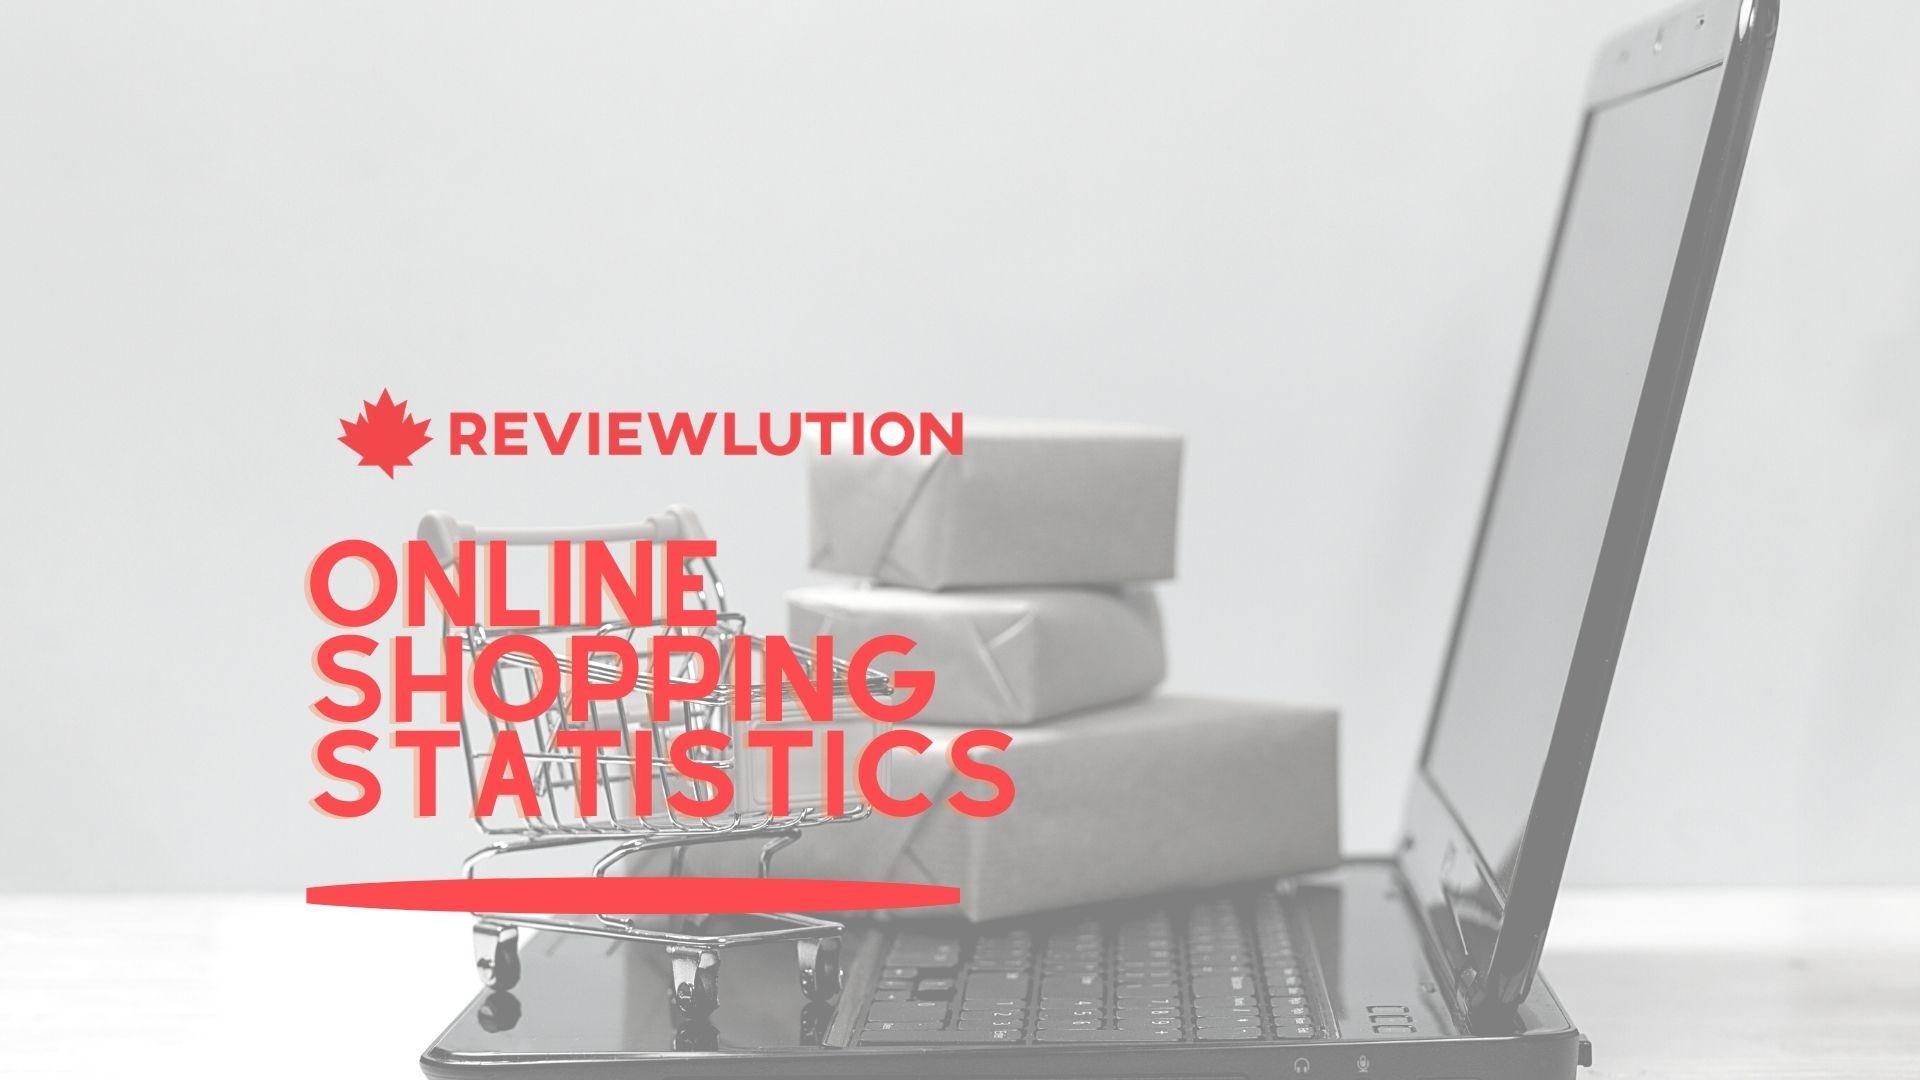 Huge Online Shopping Statistics for 2021 [Infographic]